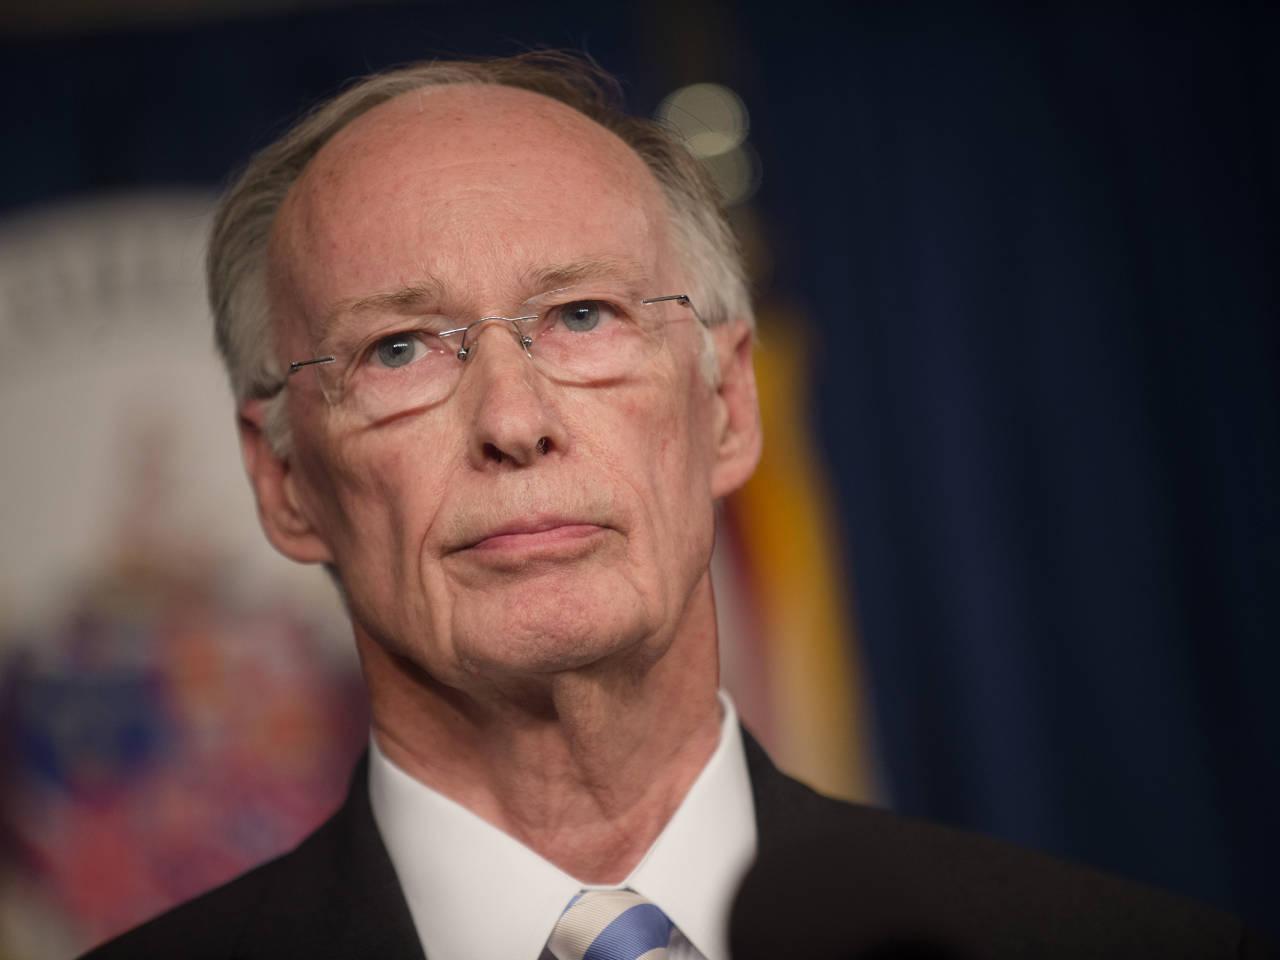 Robert Bentley says he chose to walk away from office, still